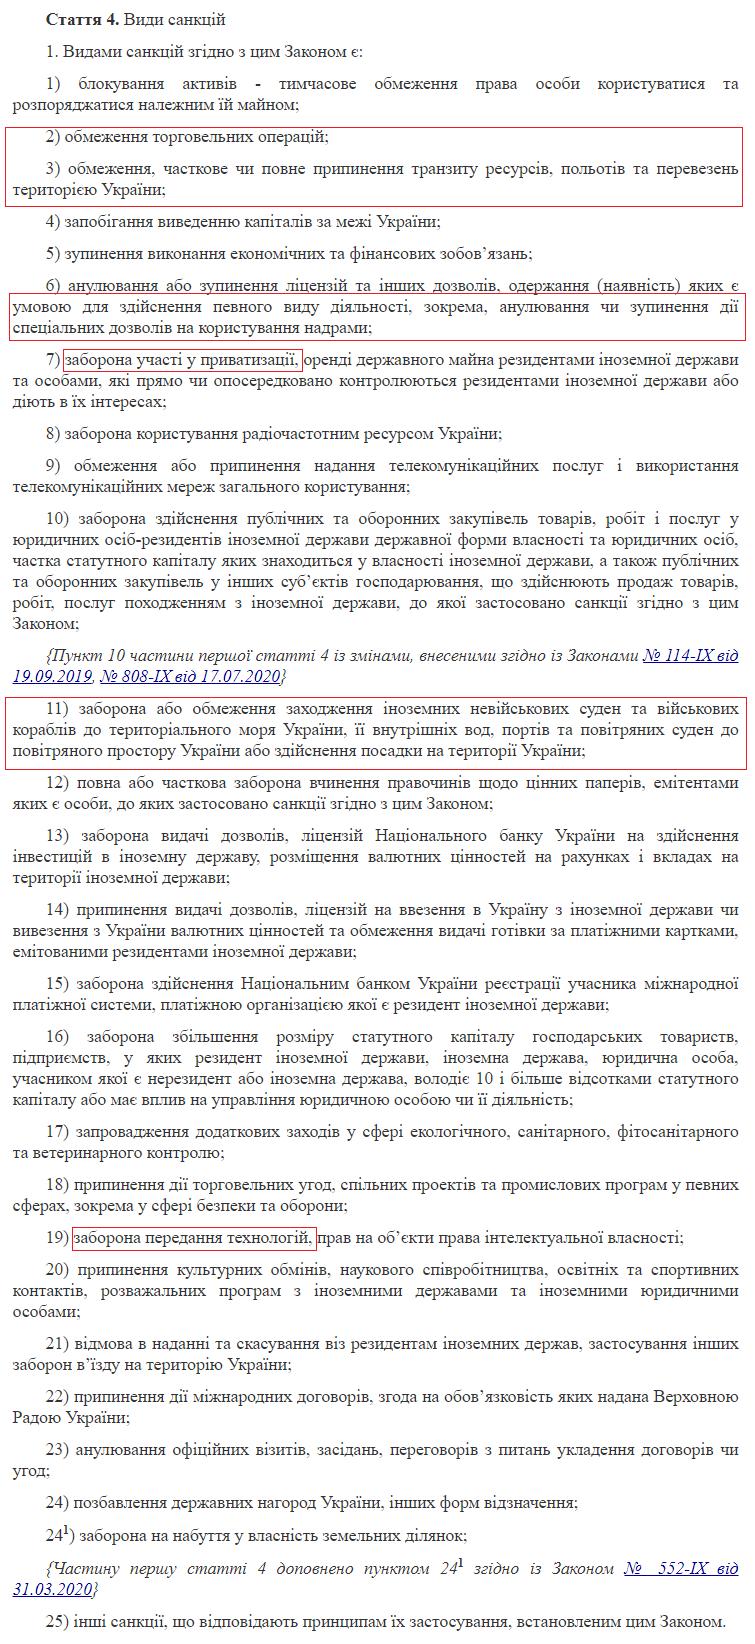 Закон о санкциях в Украине